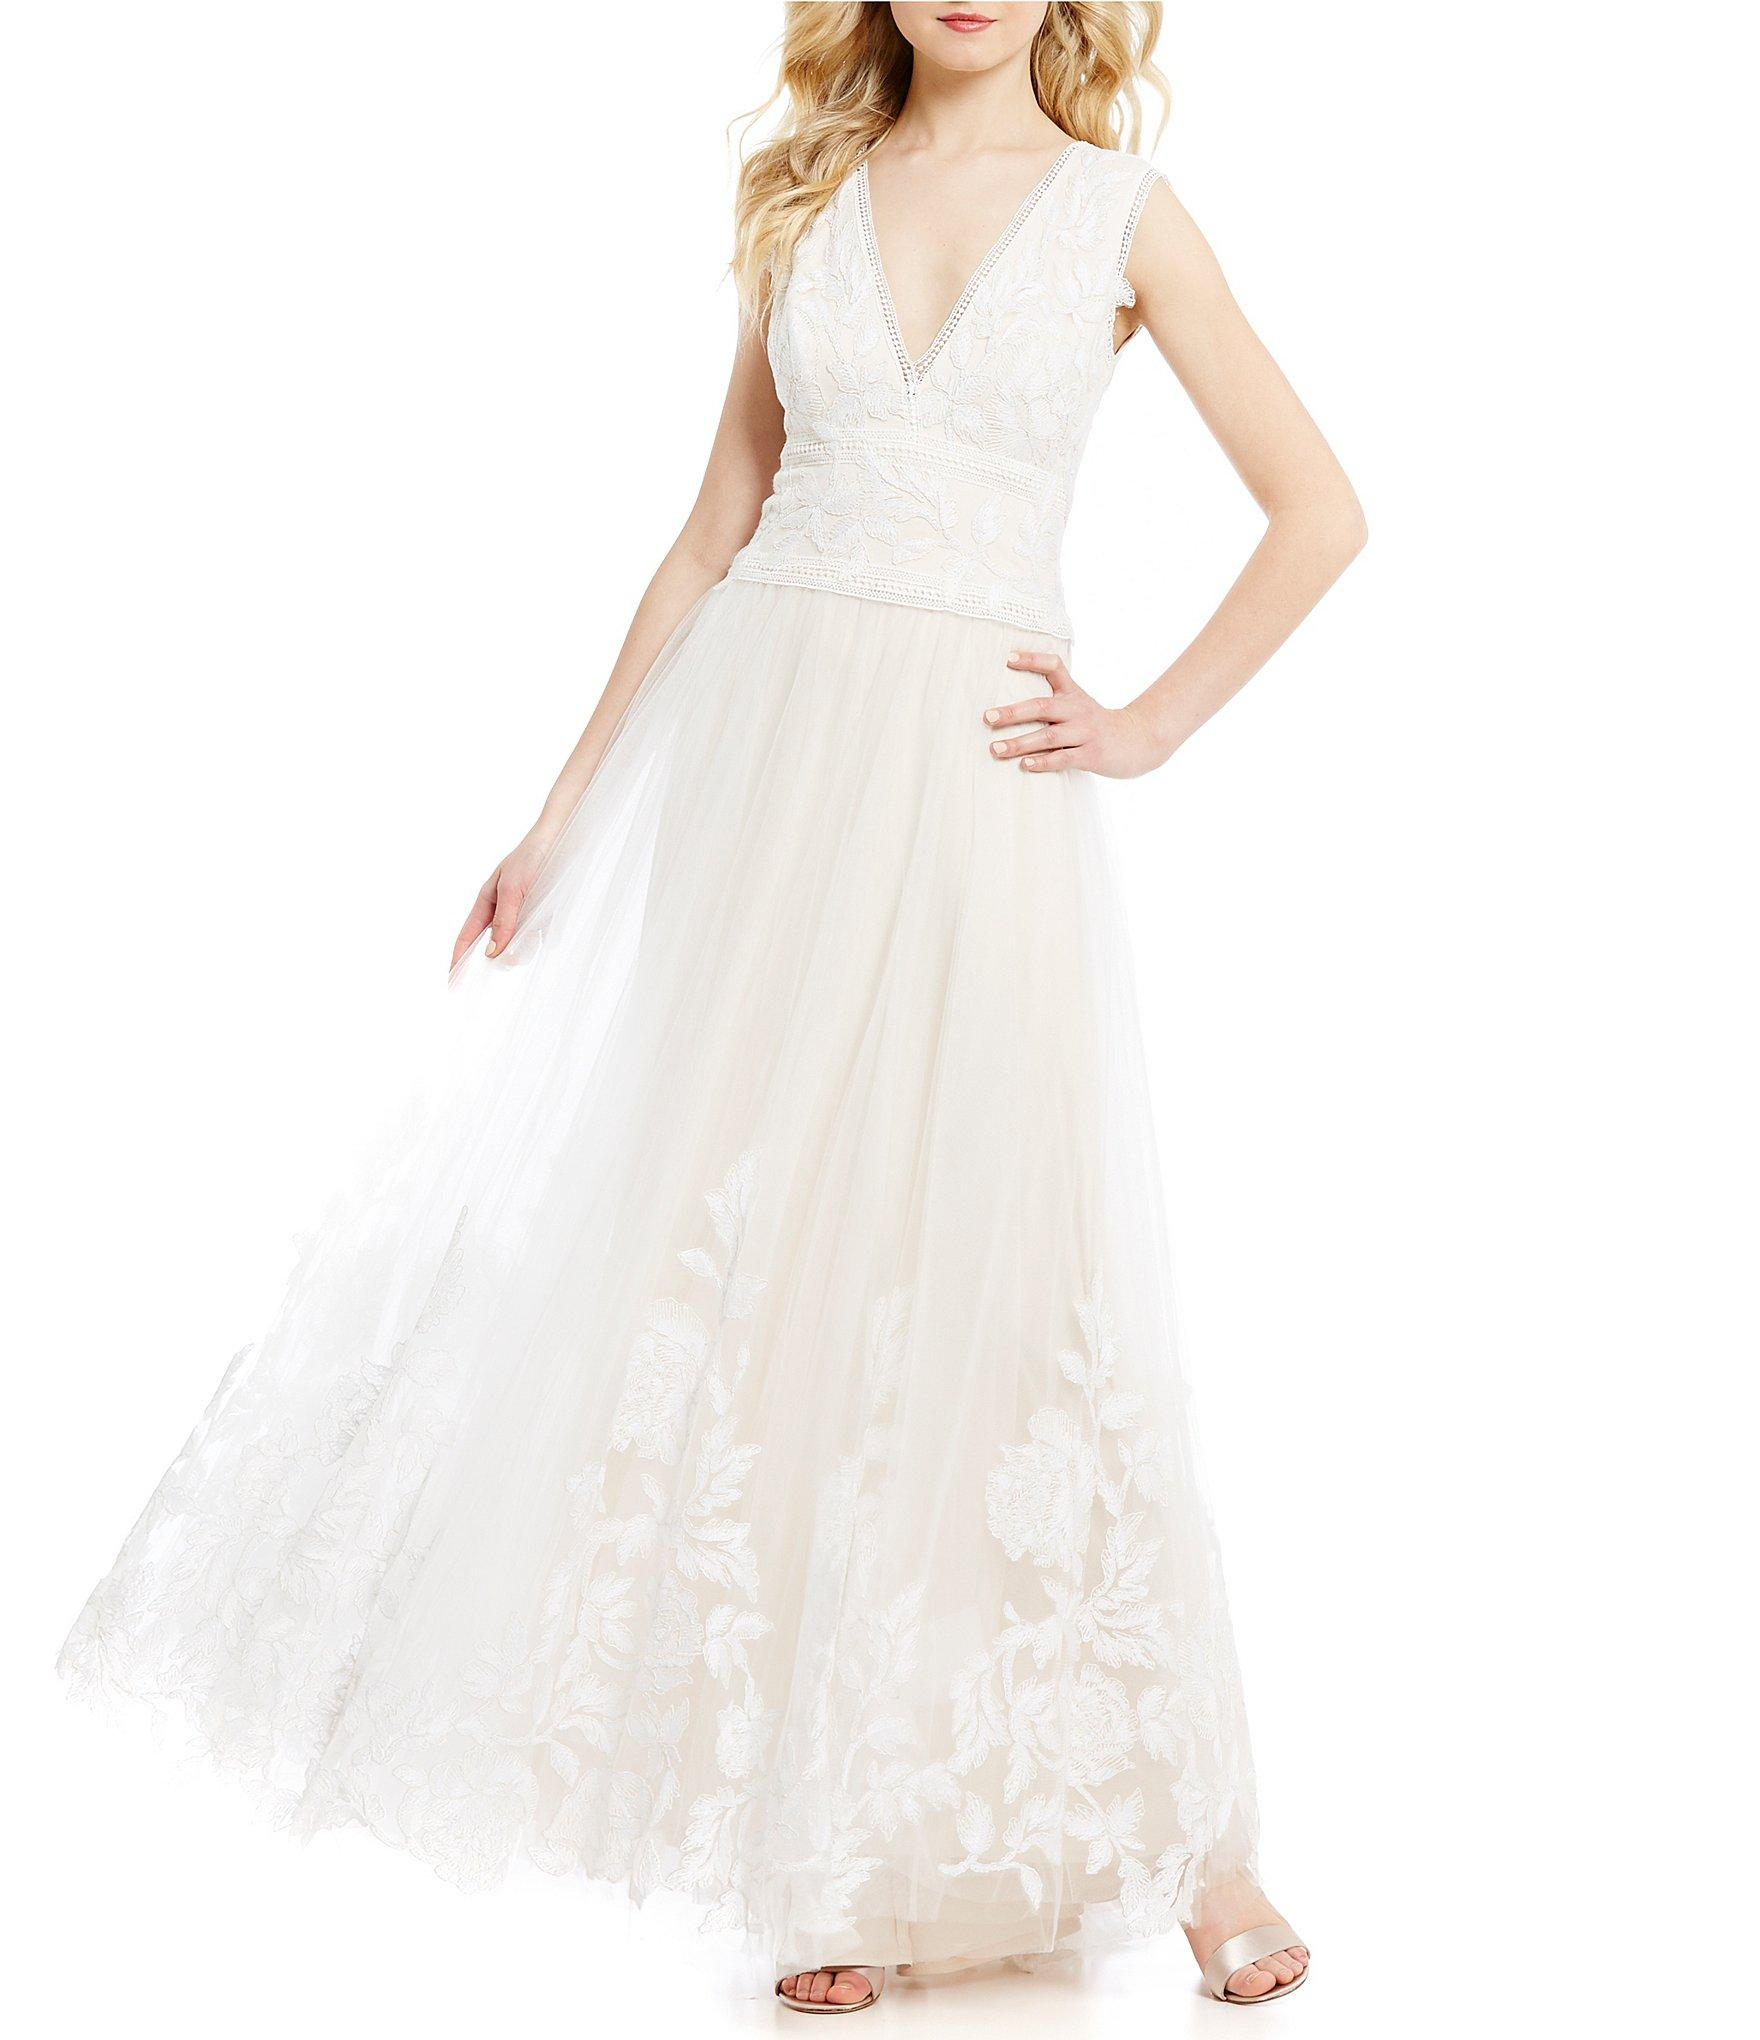 Dillards Wedding Dresses Ivory Alex Evenings Empire Waist Lace ...